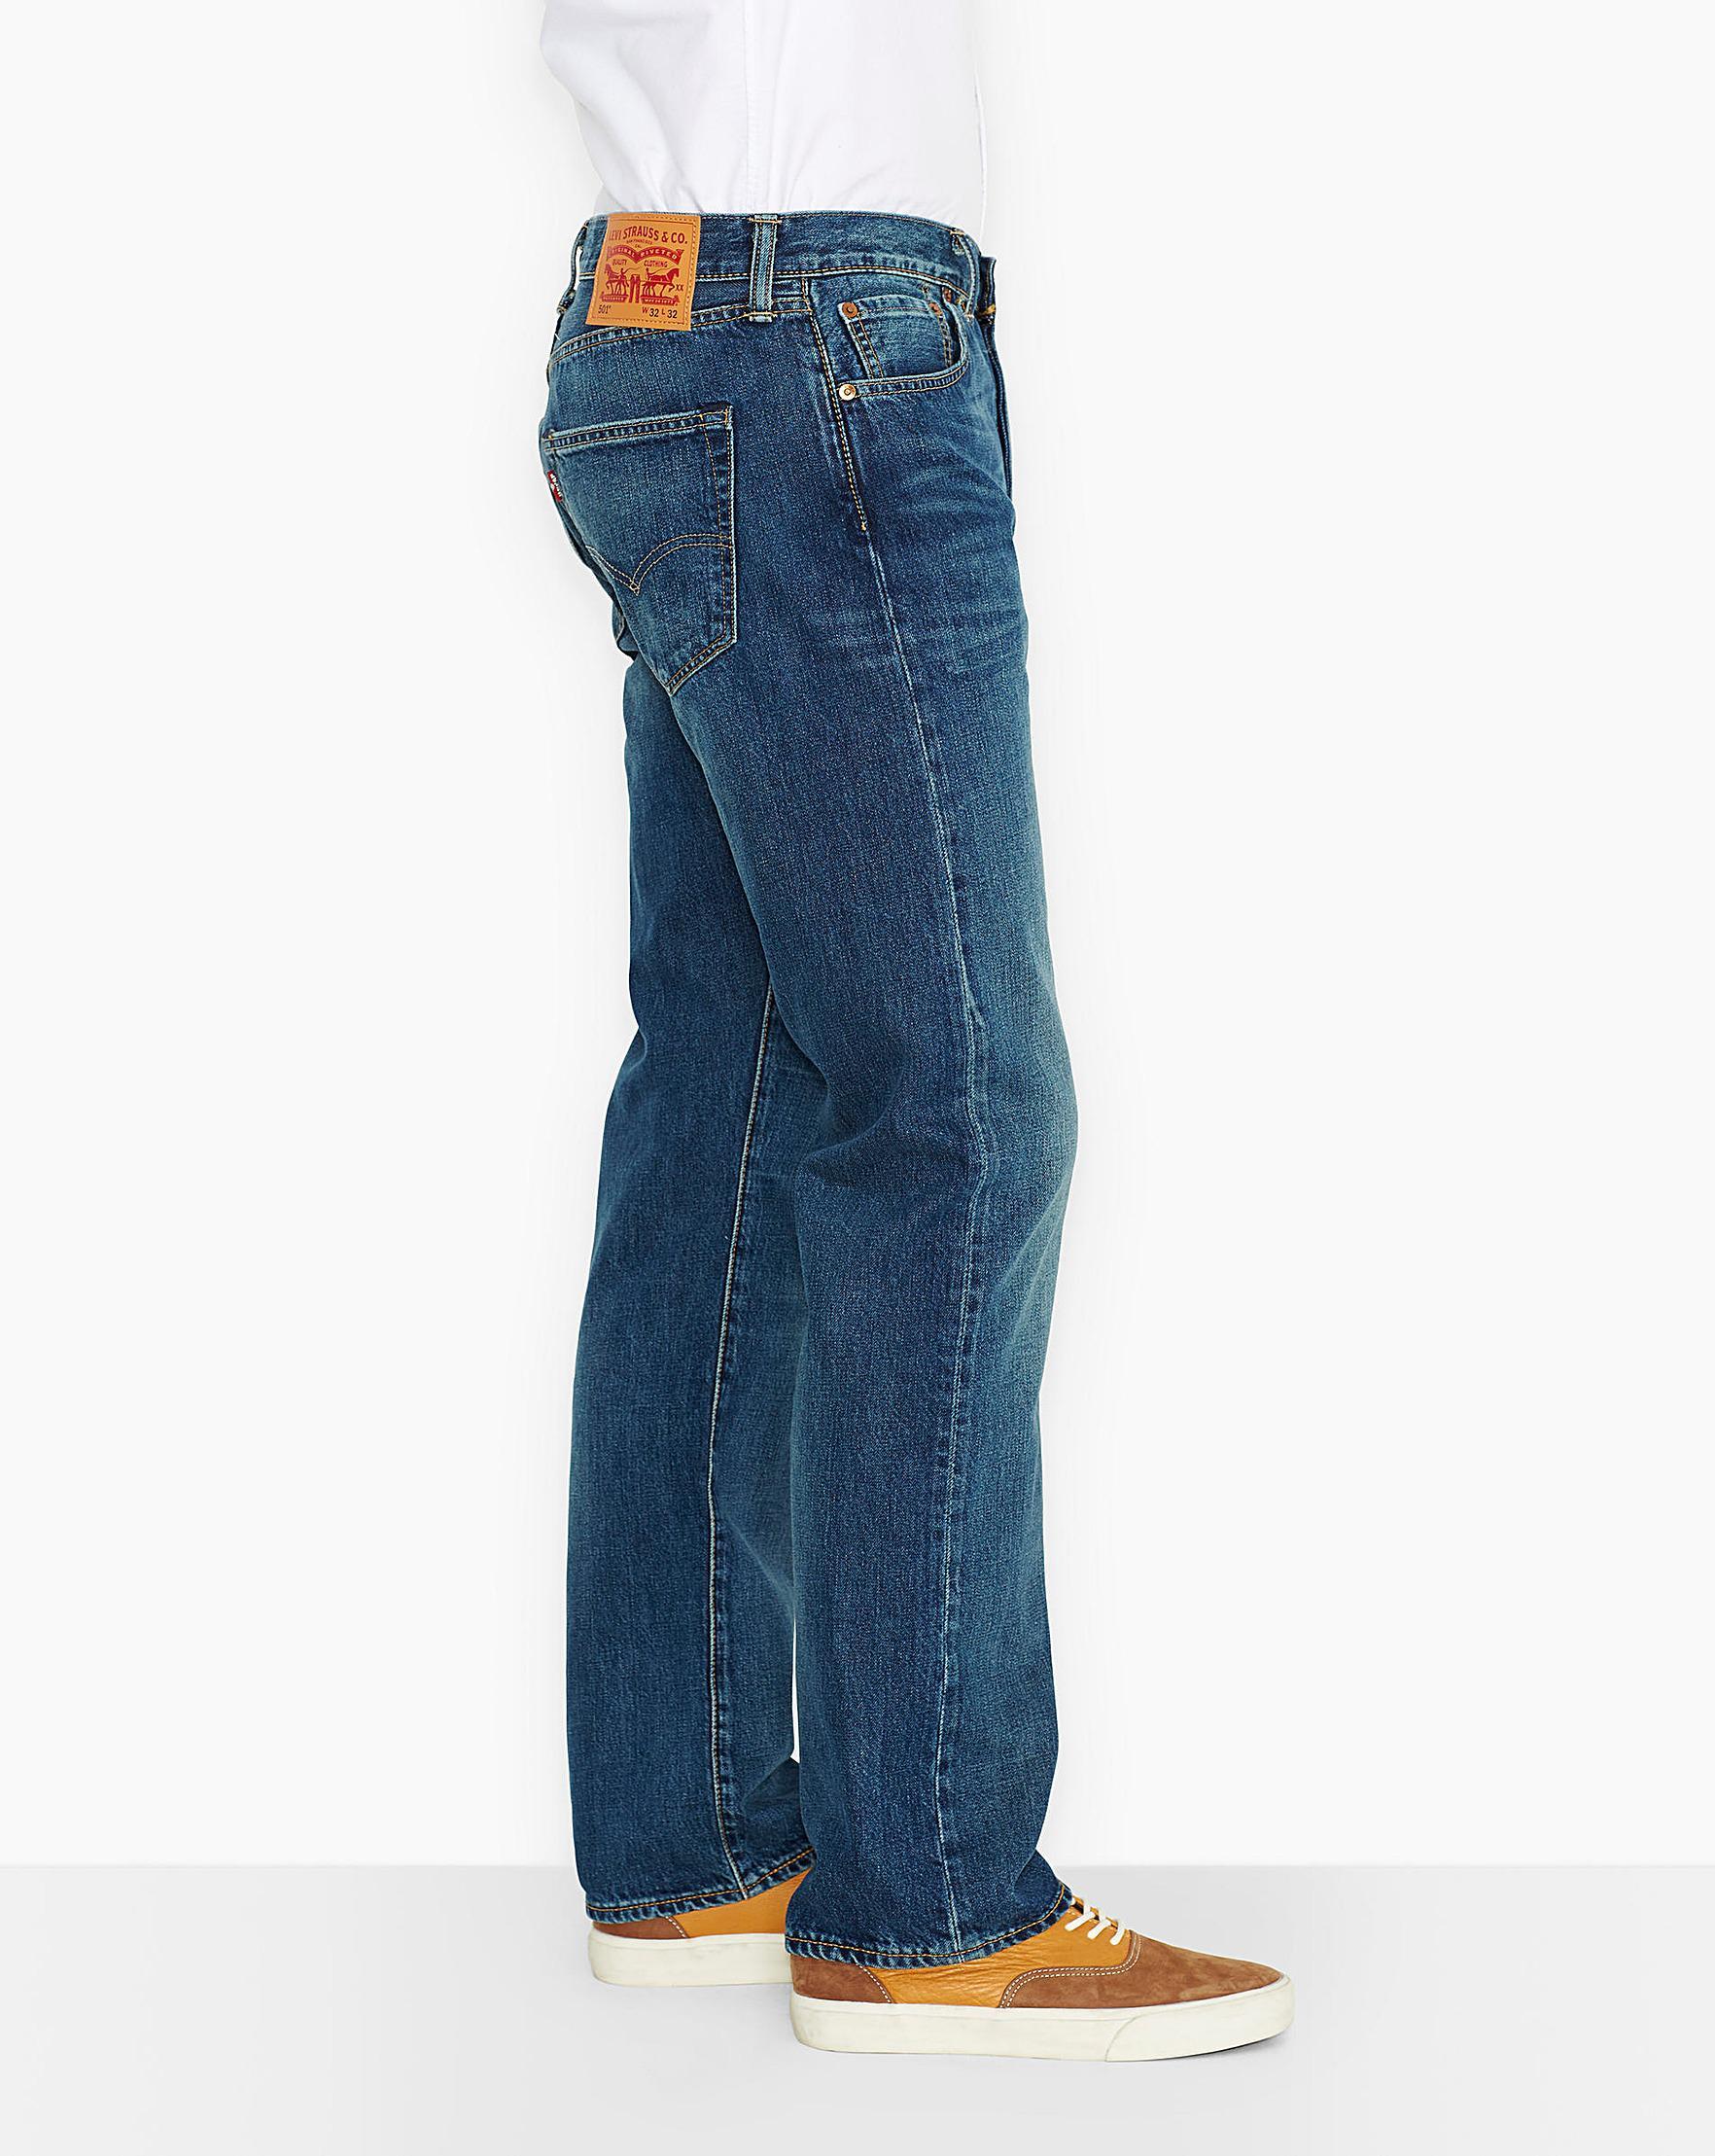 146f2063990 Levi's 501 Original Fit Hook Jean 34 In in Blue for Men - Lyst